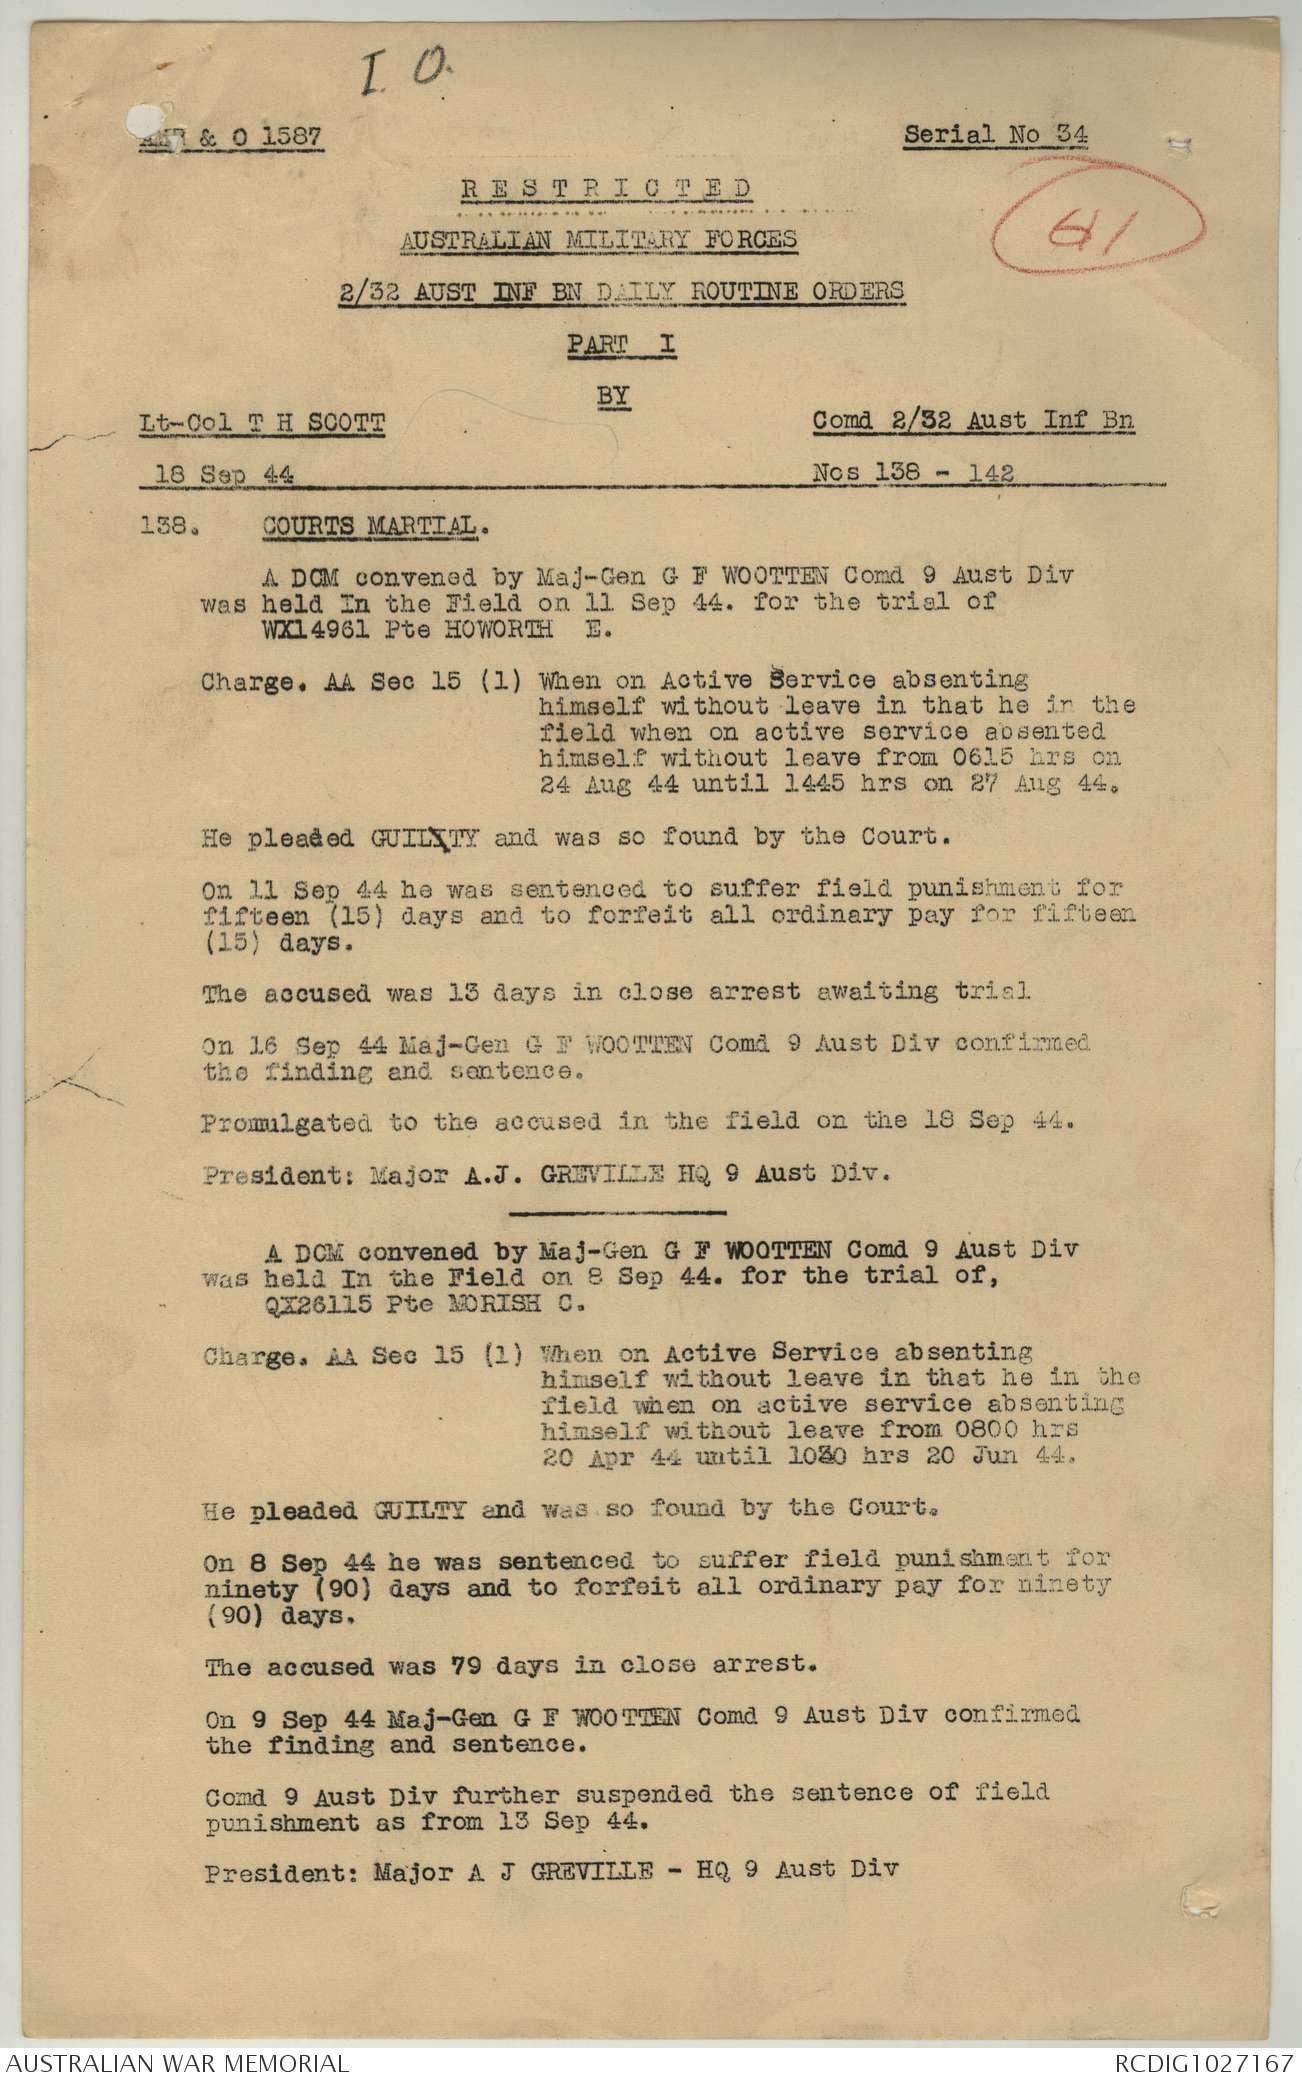 AWM52 8/3/32/26 - September - October 1944 | The Australian War Memorial